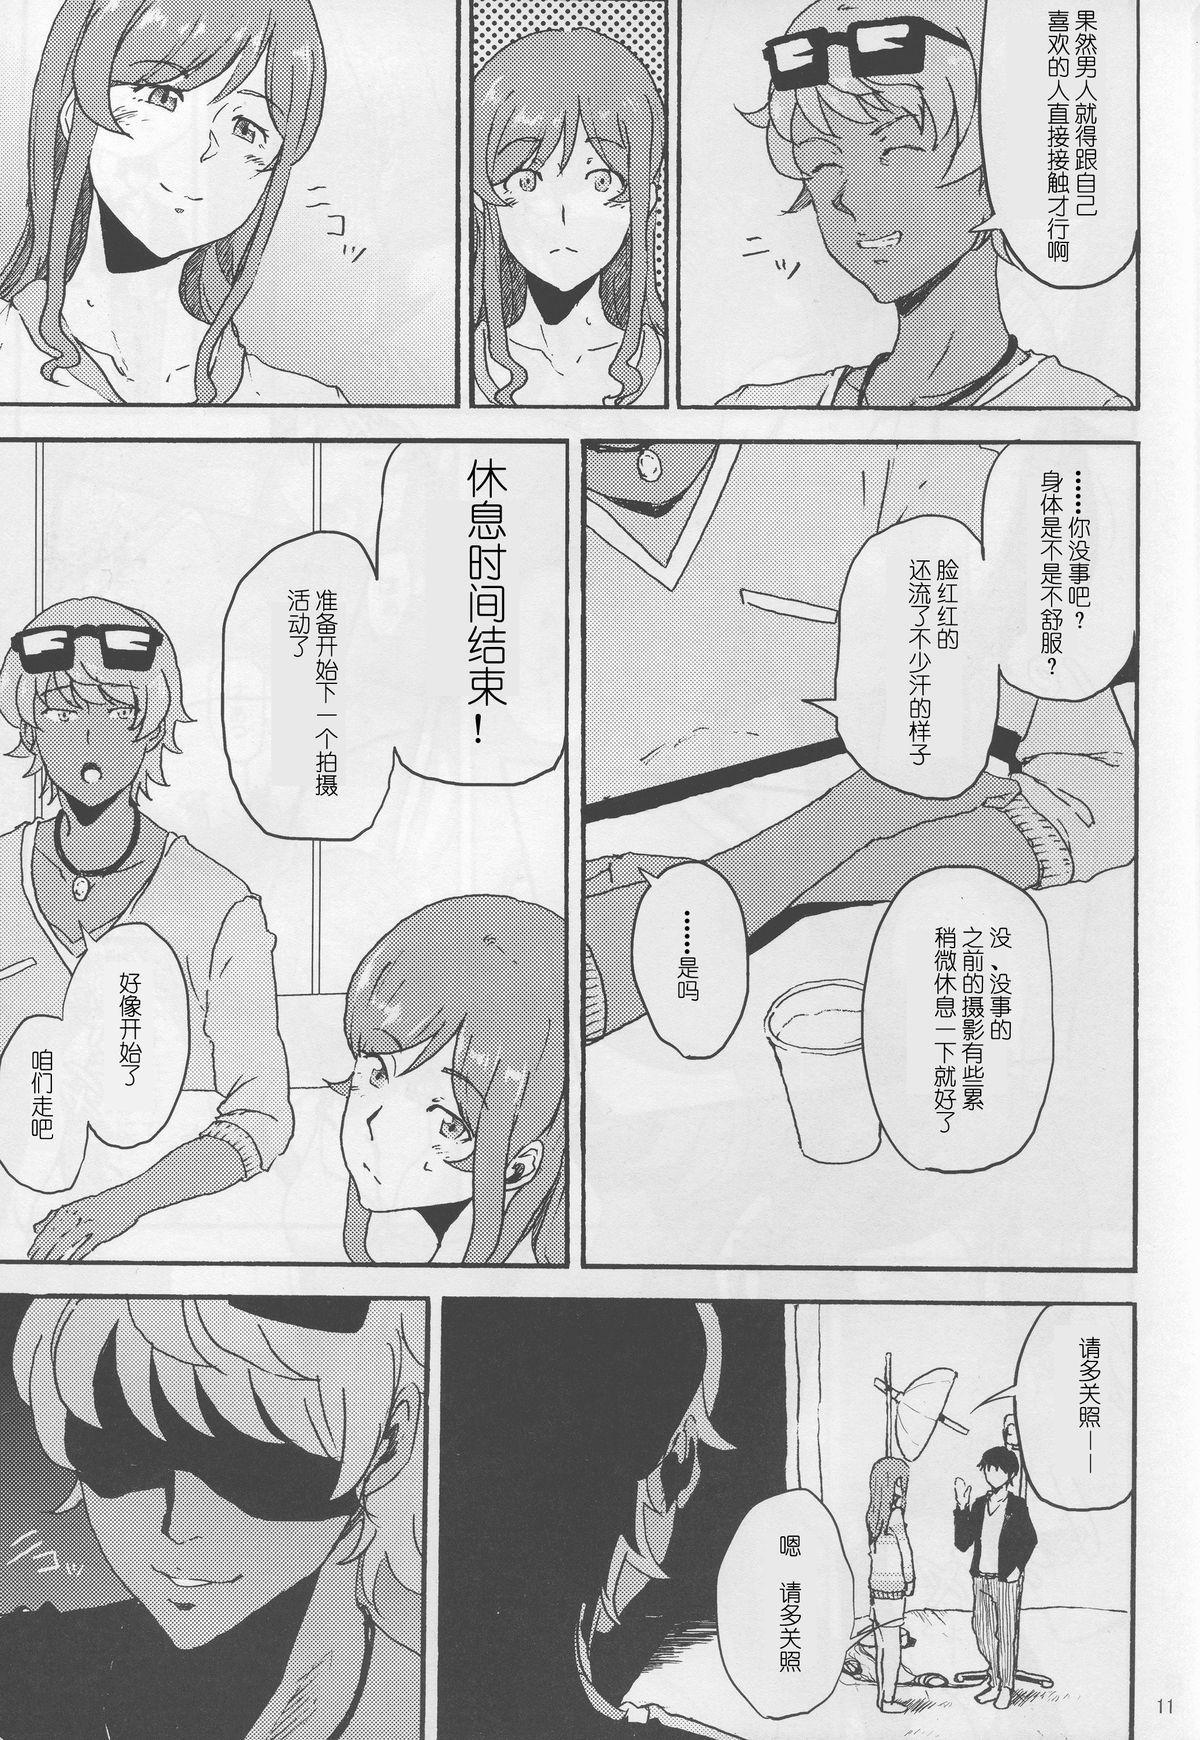 Mirai-chan ga Sandaime SGOCK no Leader ni Damasare Yarechau Hon 11